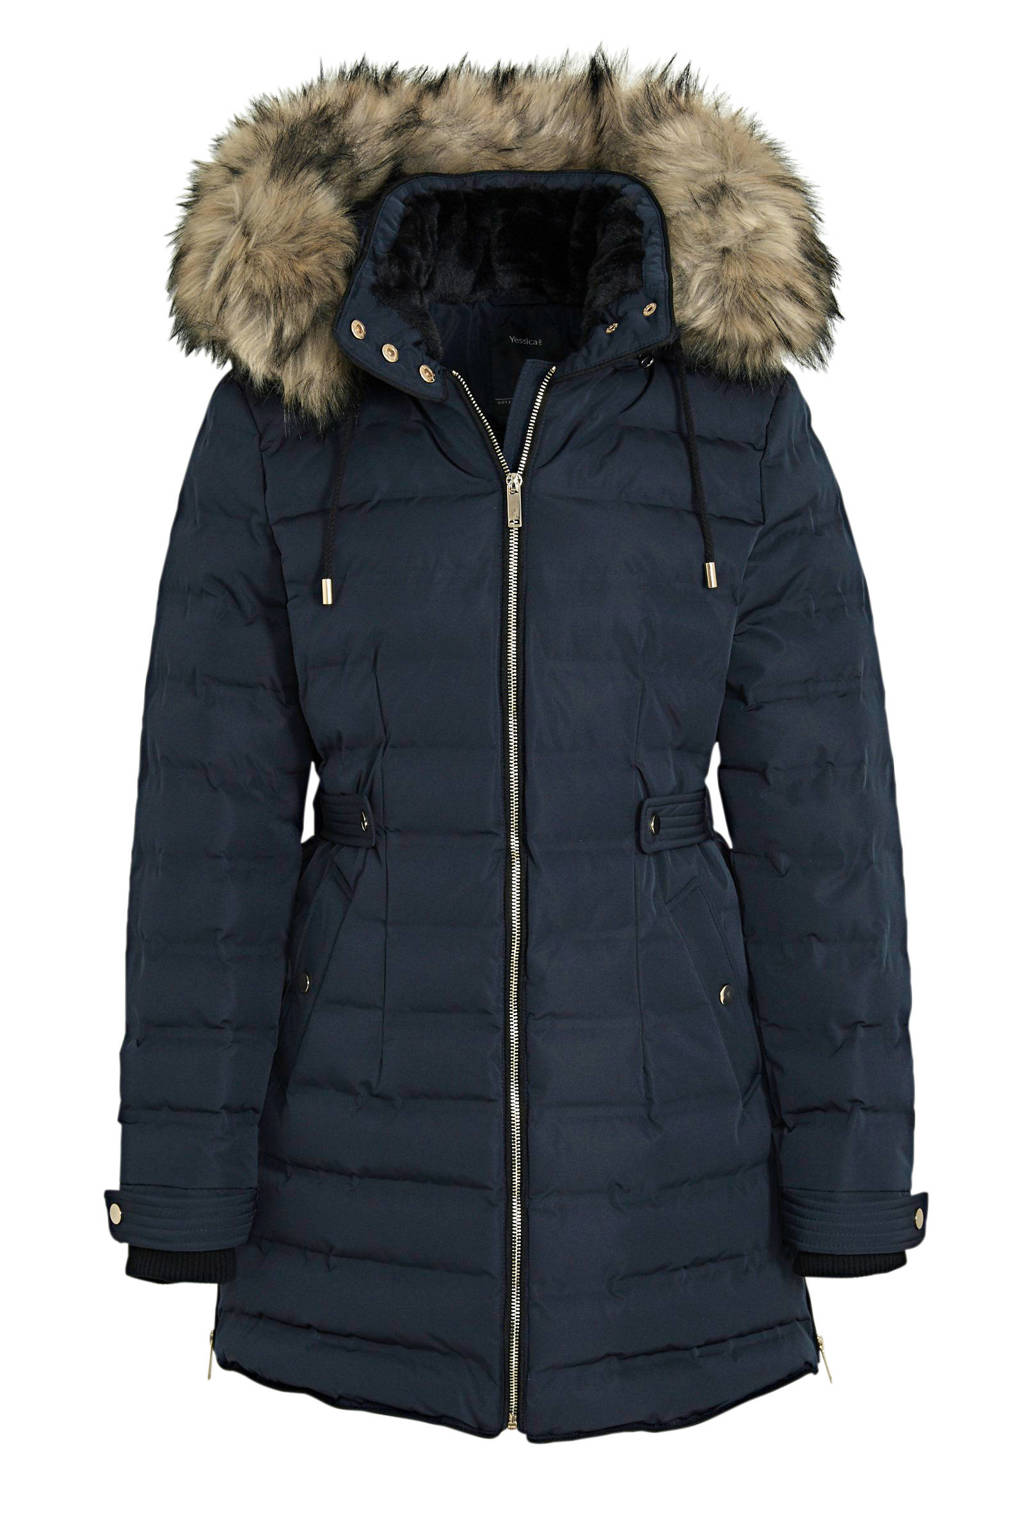 C&A Yessica gewatteerde jas donkerblauw, Donkerblauw